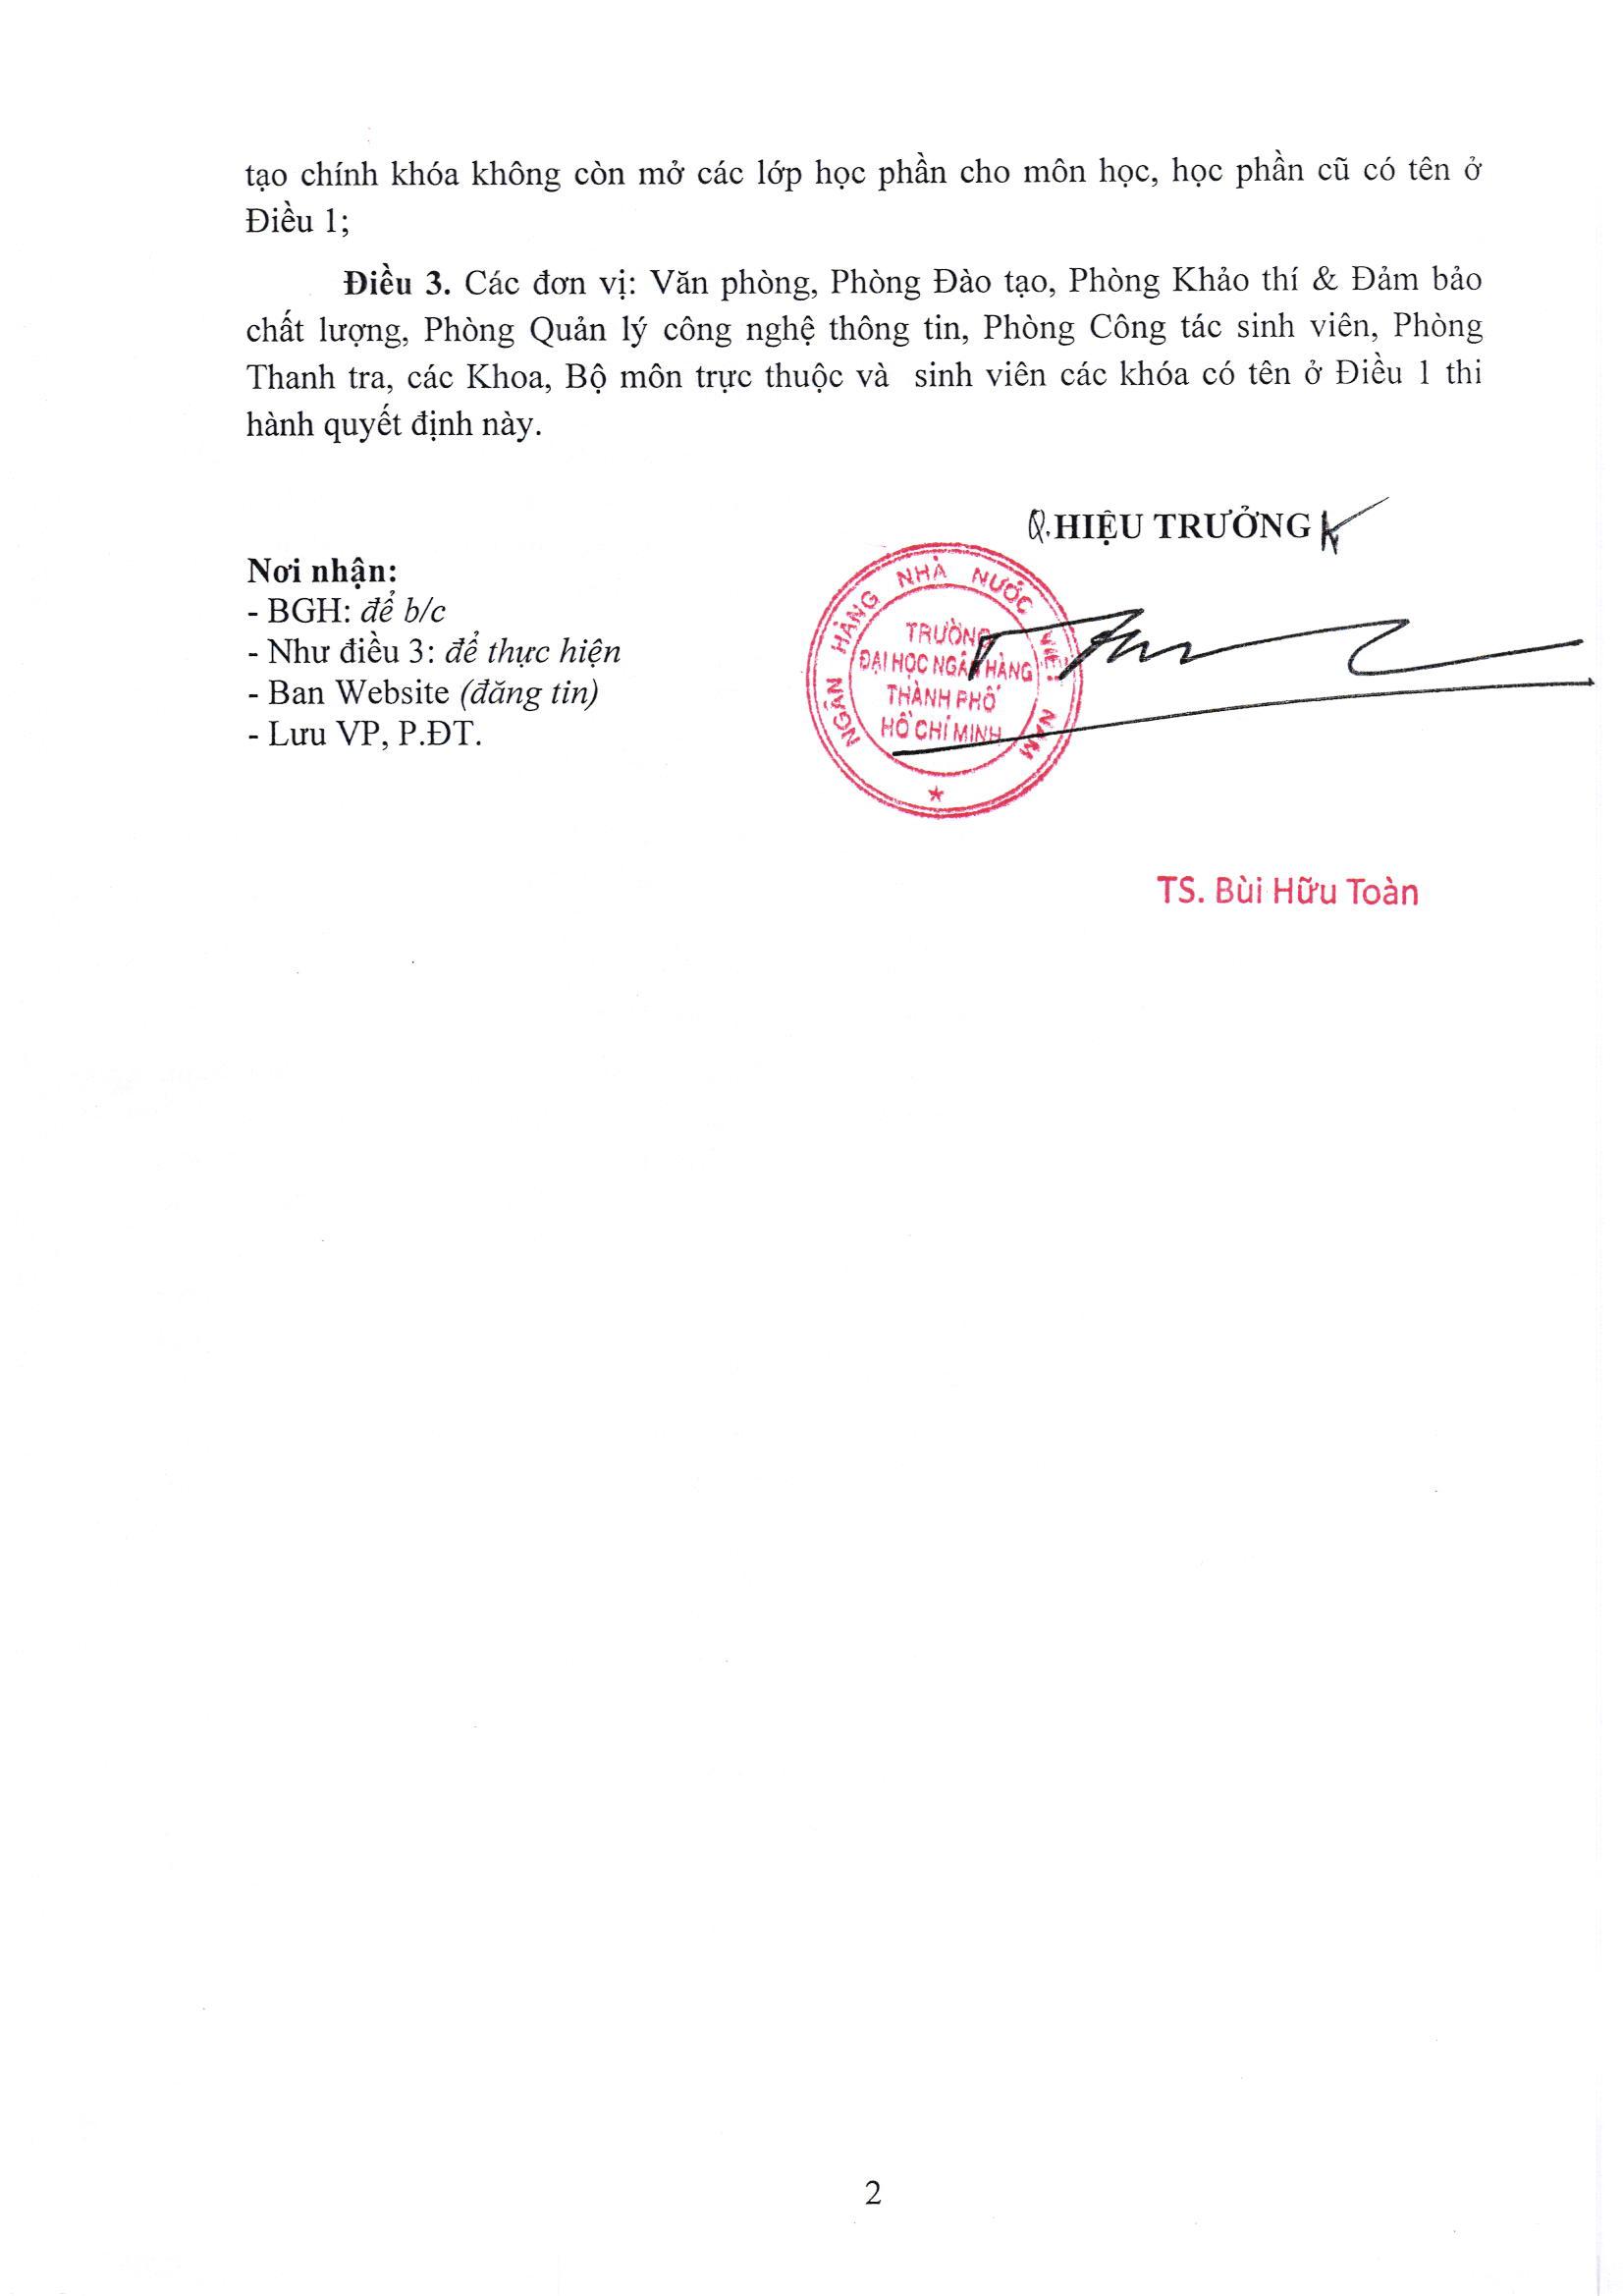 1819.18-Danh muc cac mon hoc-hoc phan tuong duong va thay the mon hoc hoc phan DHCQ K30-31-32_Page_2